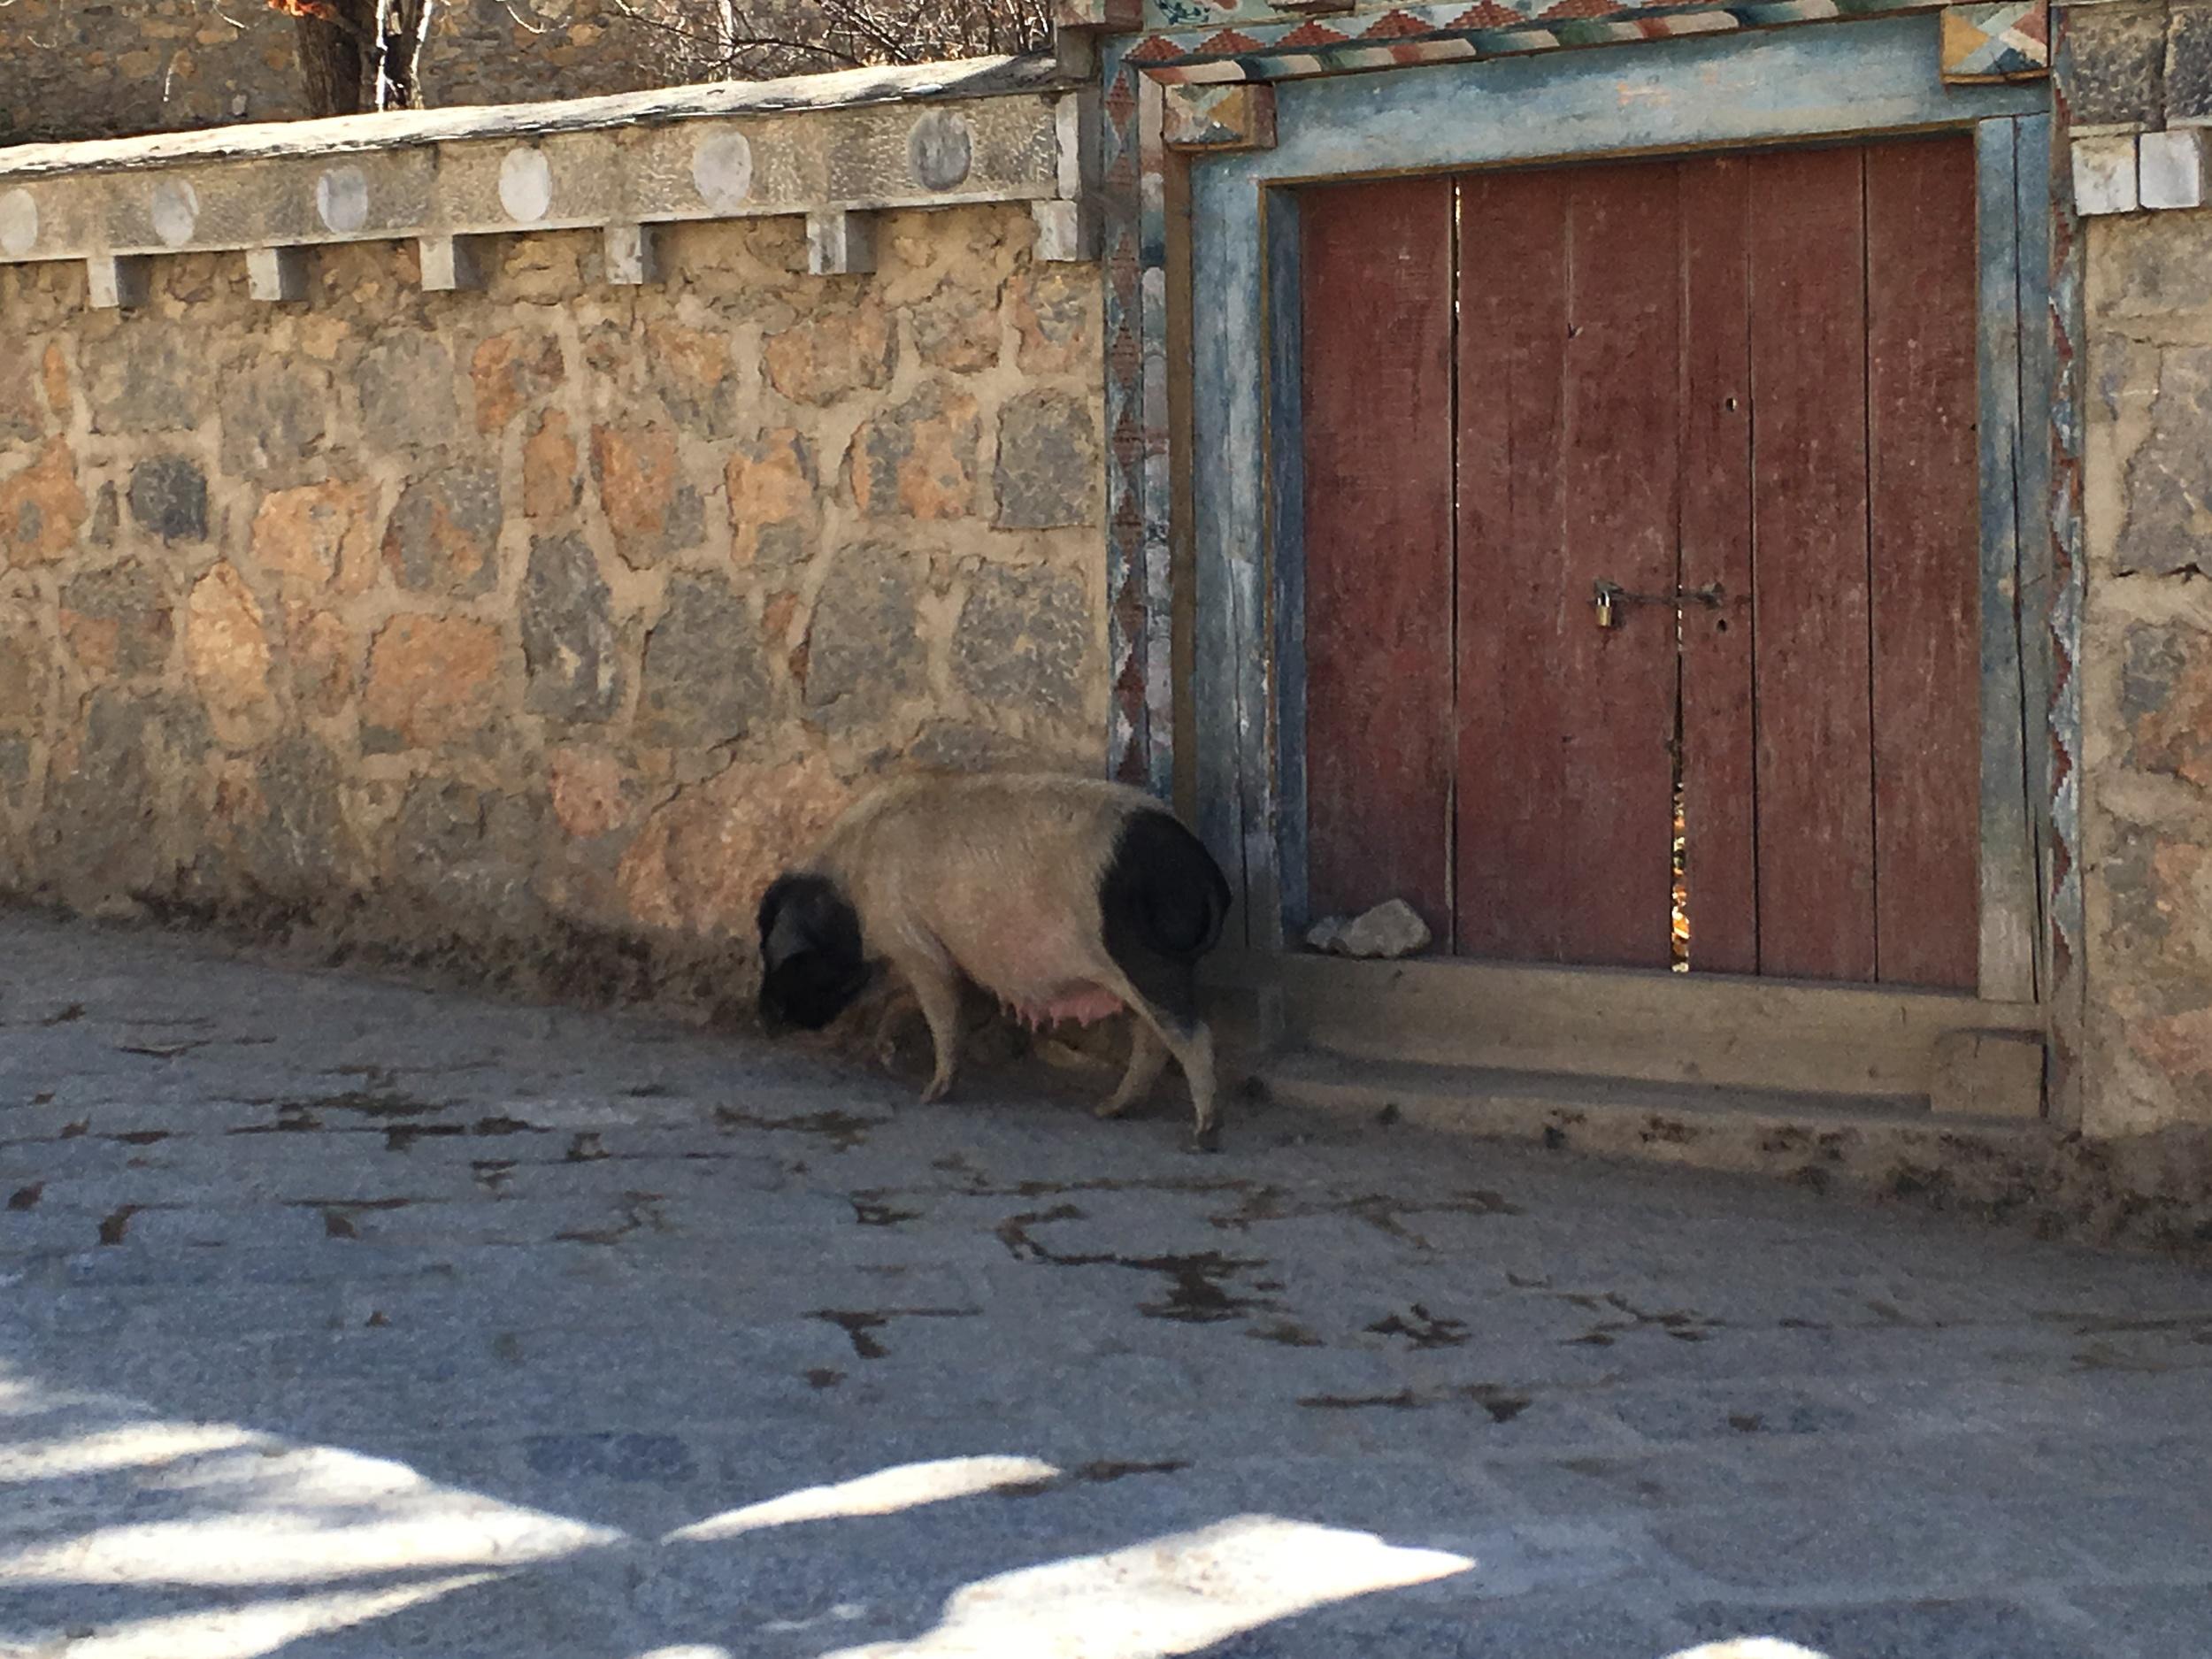 Pig outside Songzanlin Monastery in Shangri La